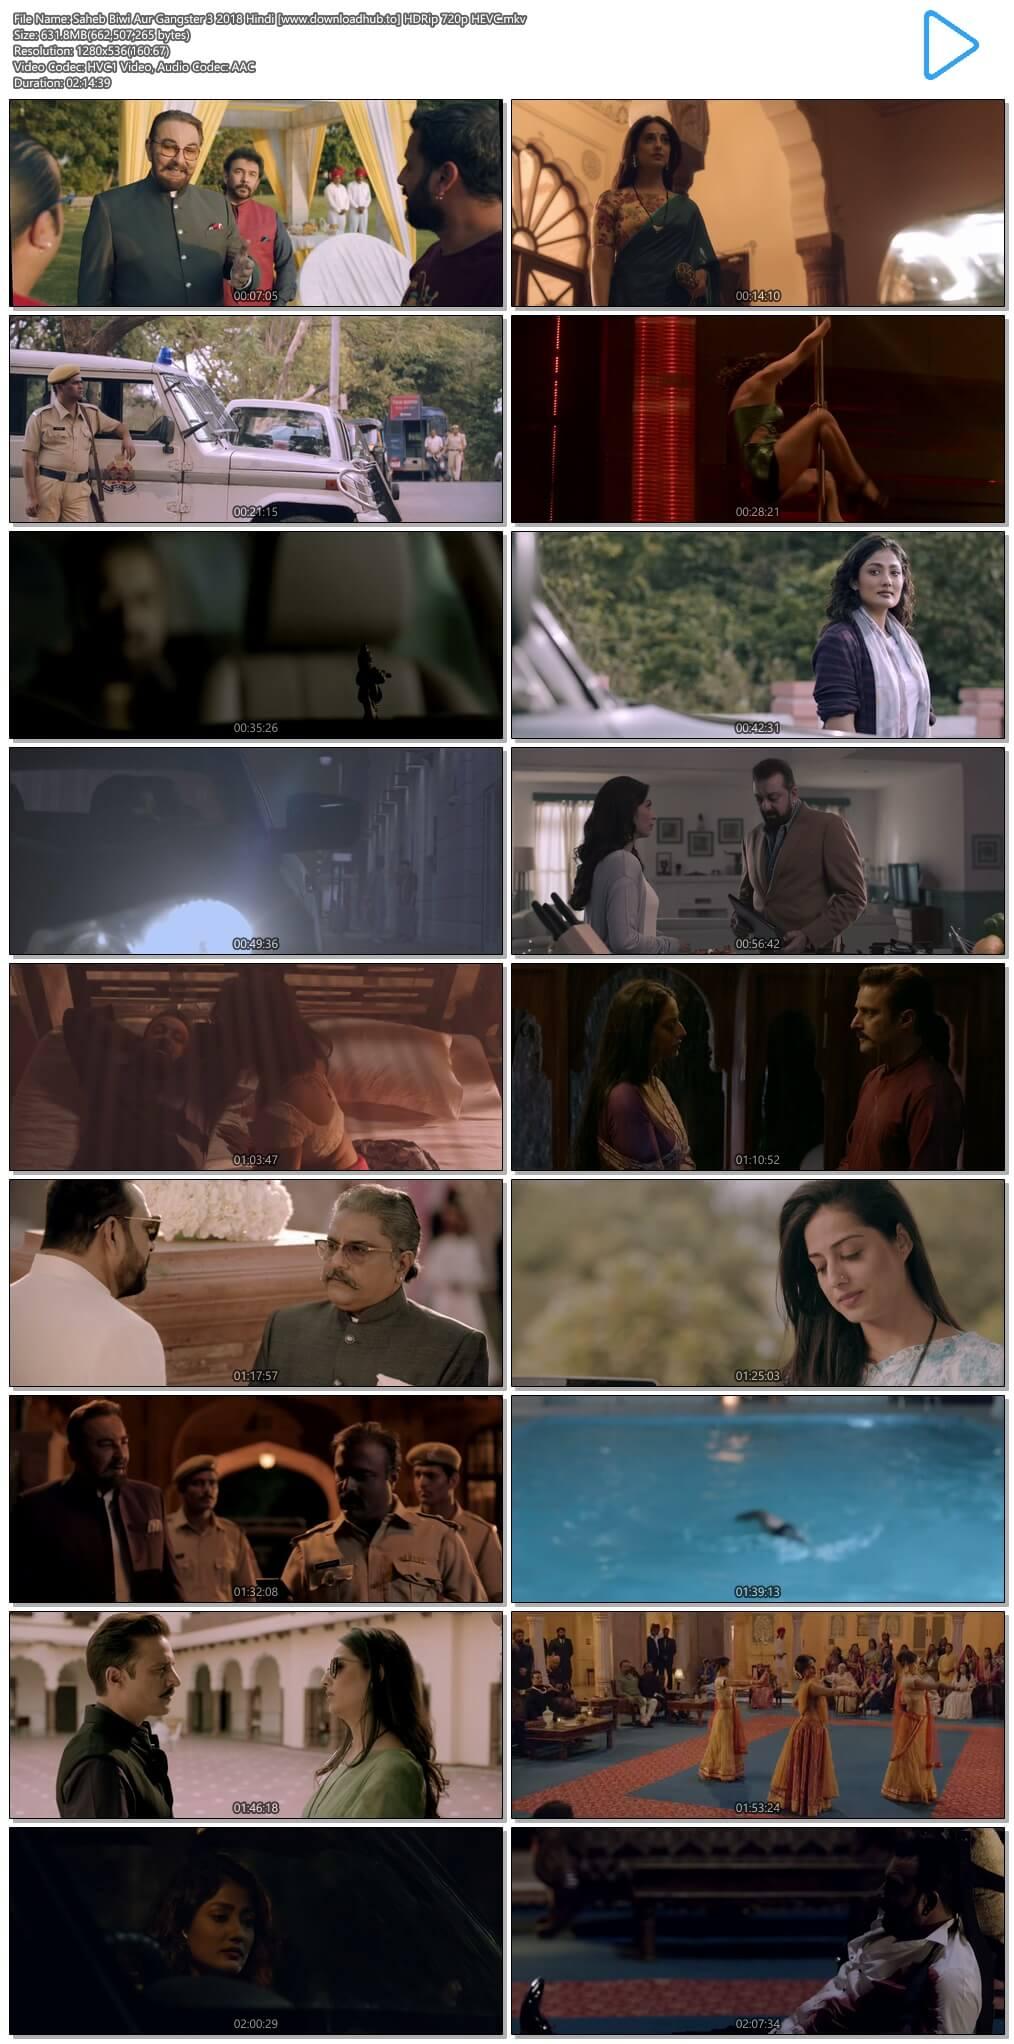 Saheb Biwi Aur Gangster 3 2018 Hindi 600MB HDRip 720p HEVC